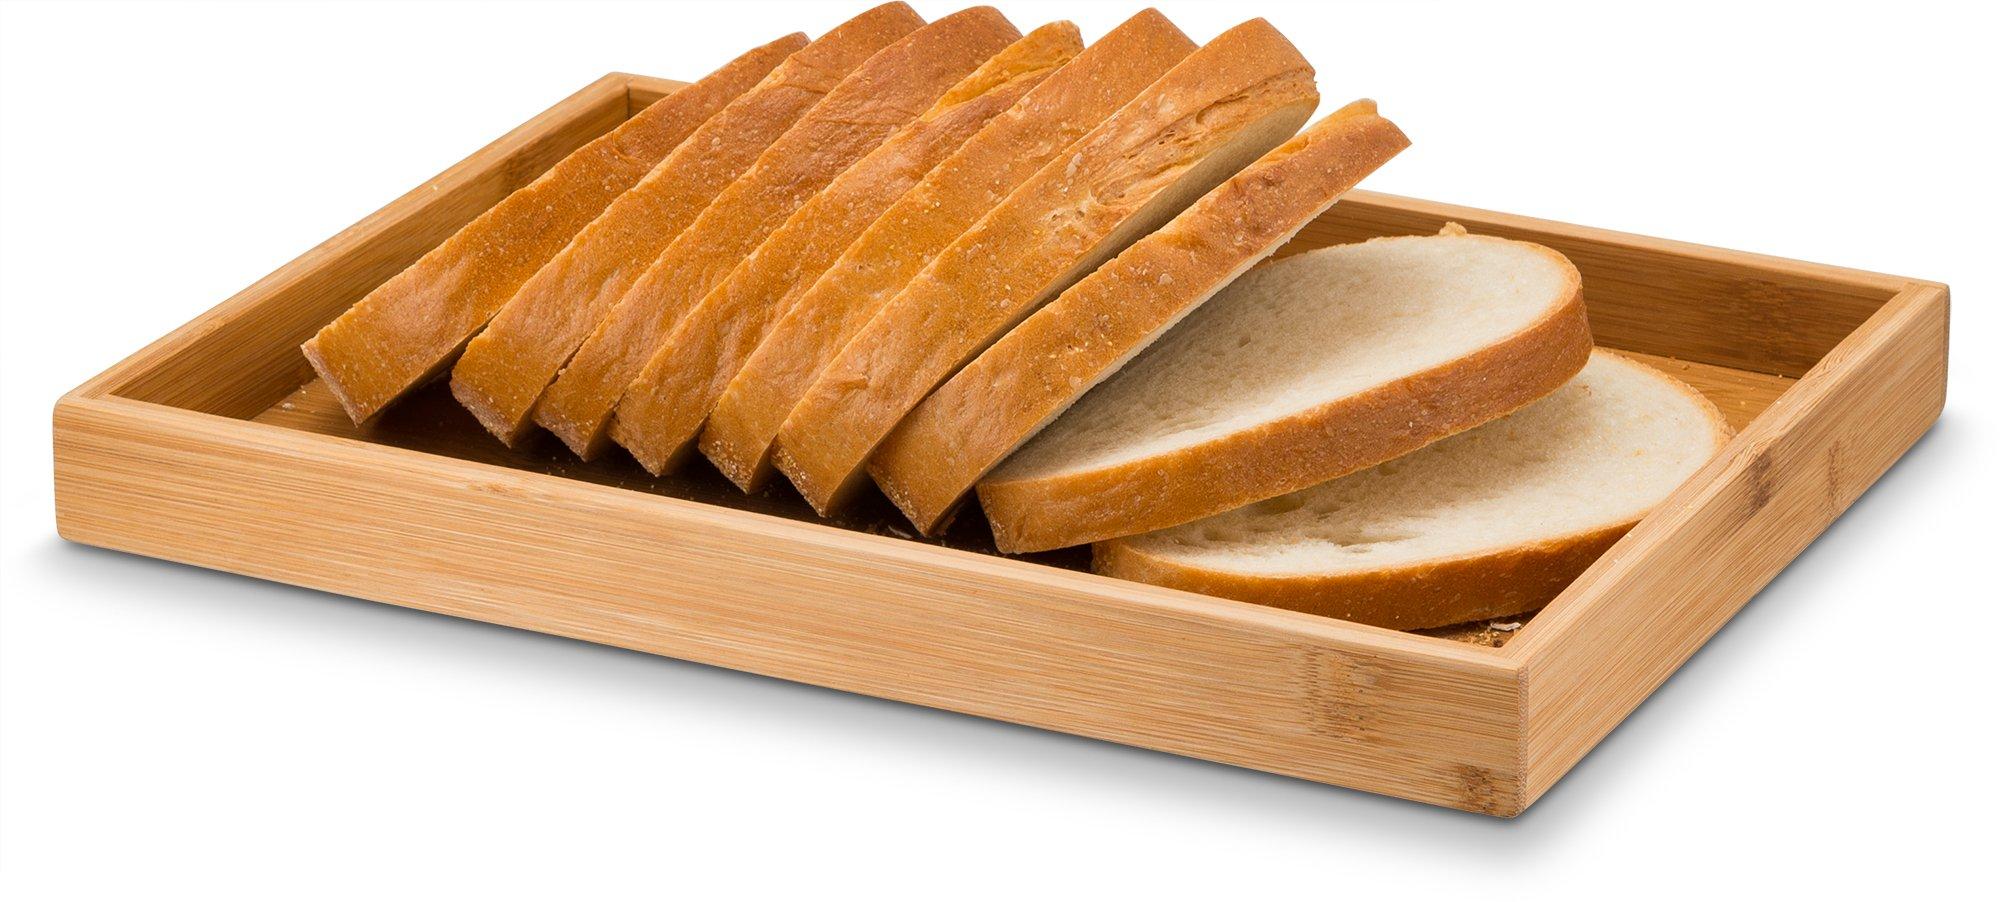 Bread Slicing Guide   eBay